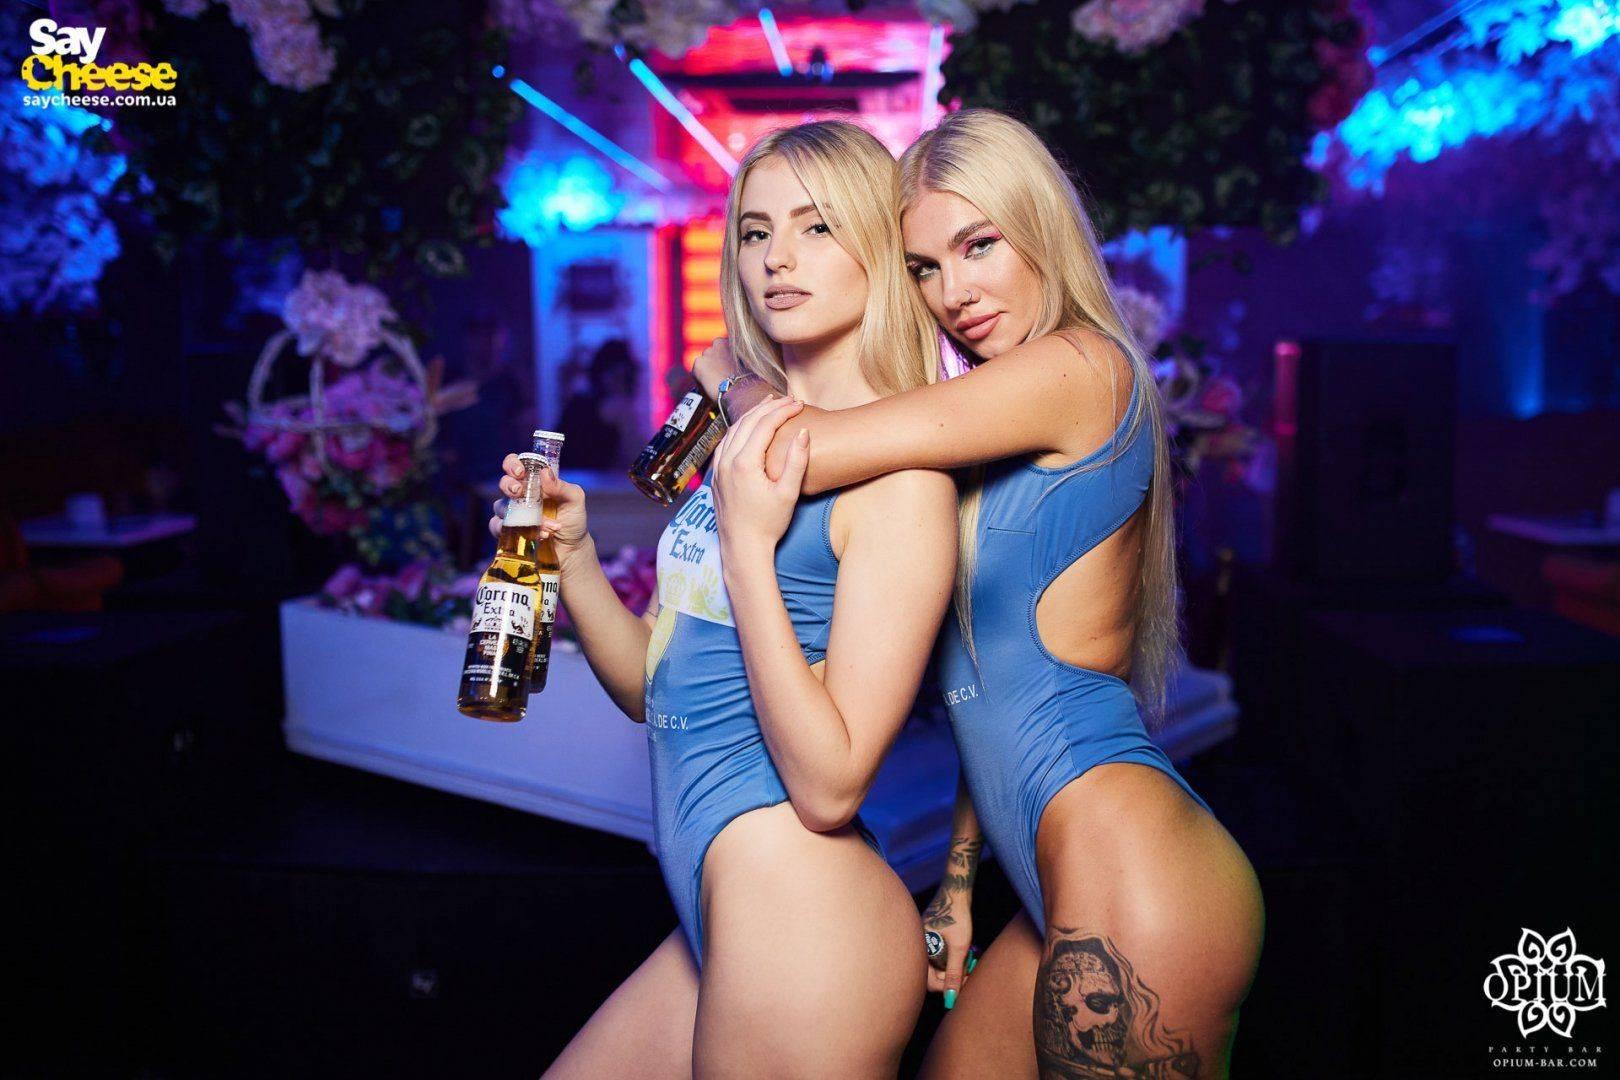 Opium Party Bar — Corona Extra Afterparty фотоотчет Saycheese